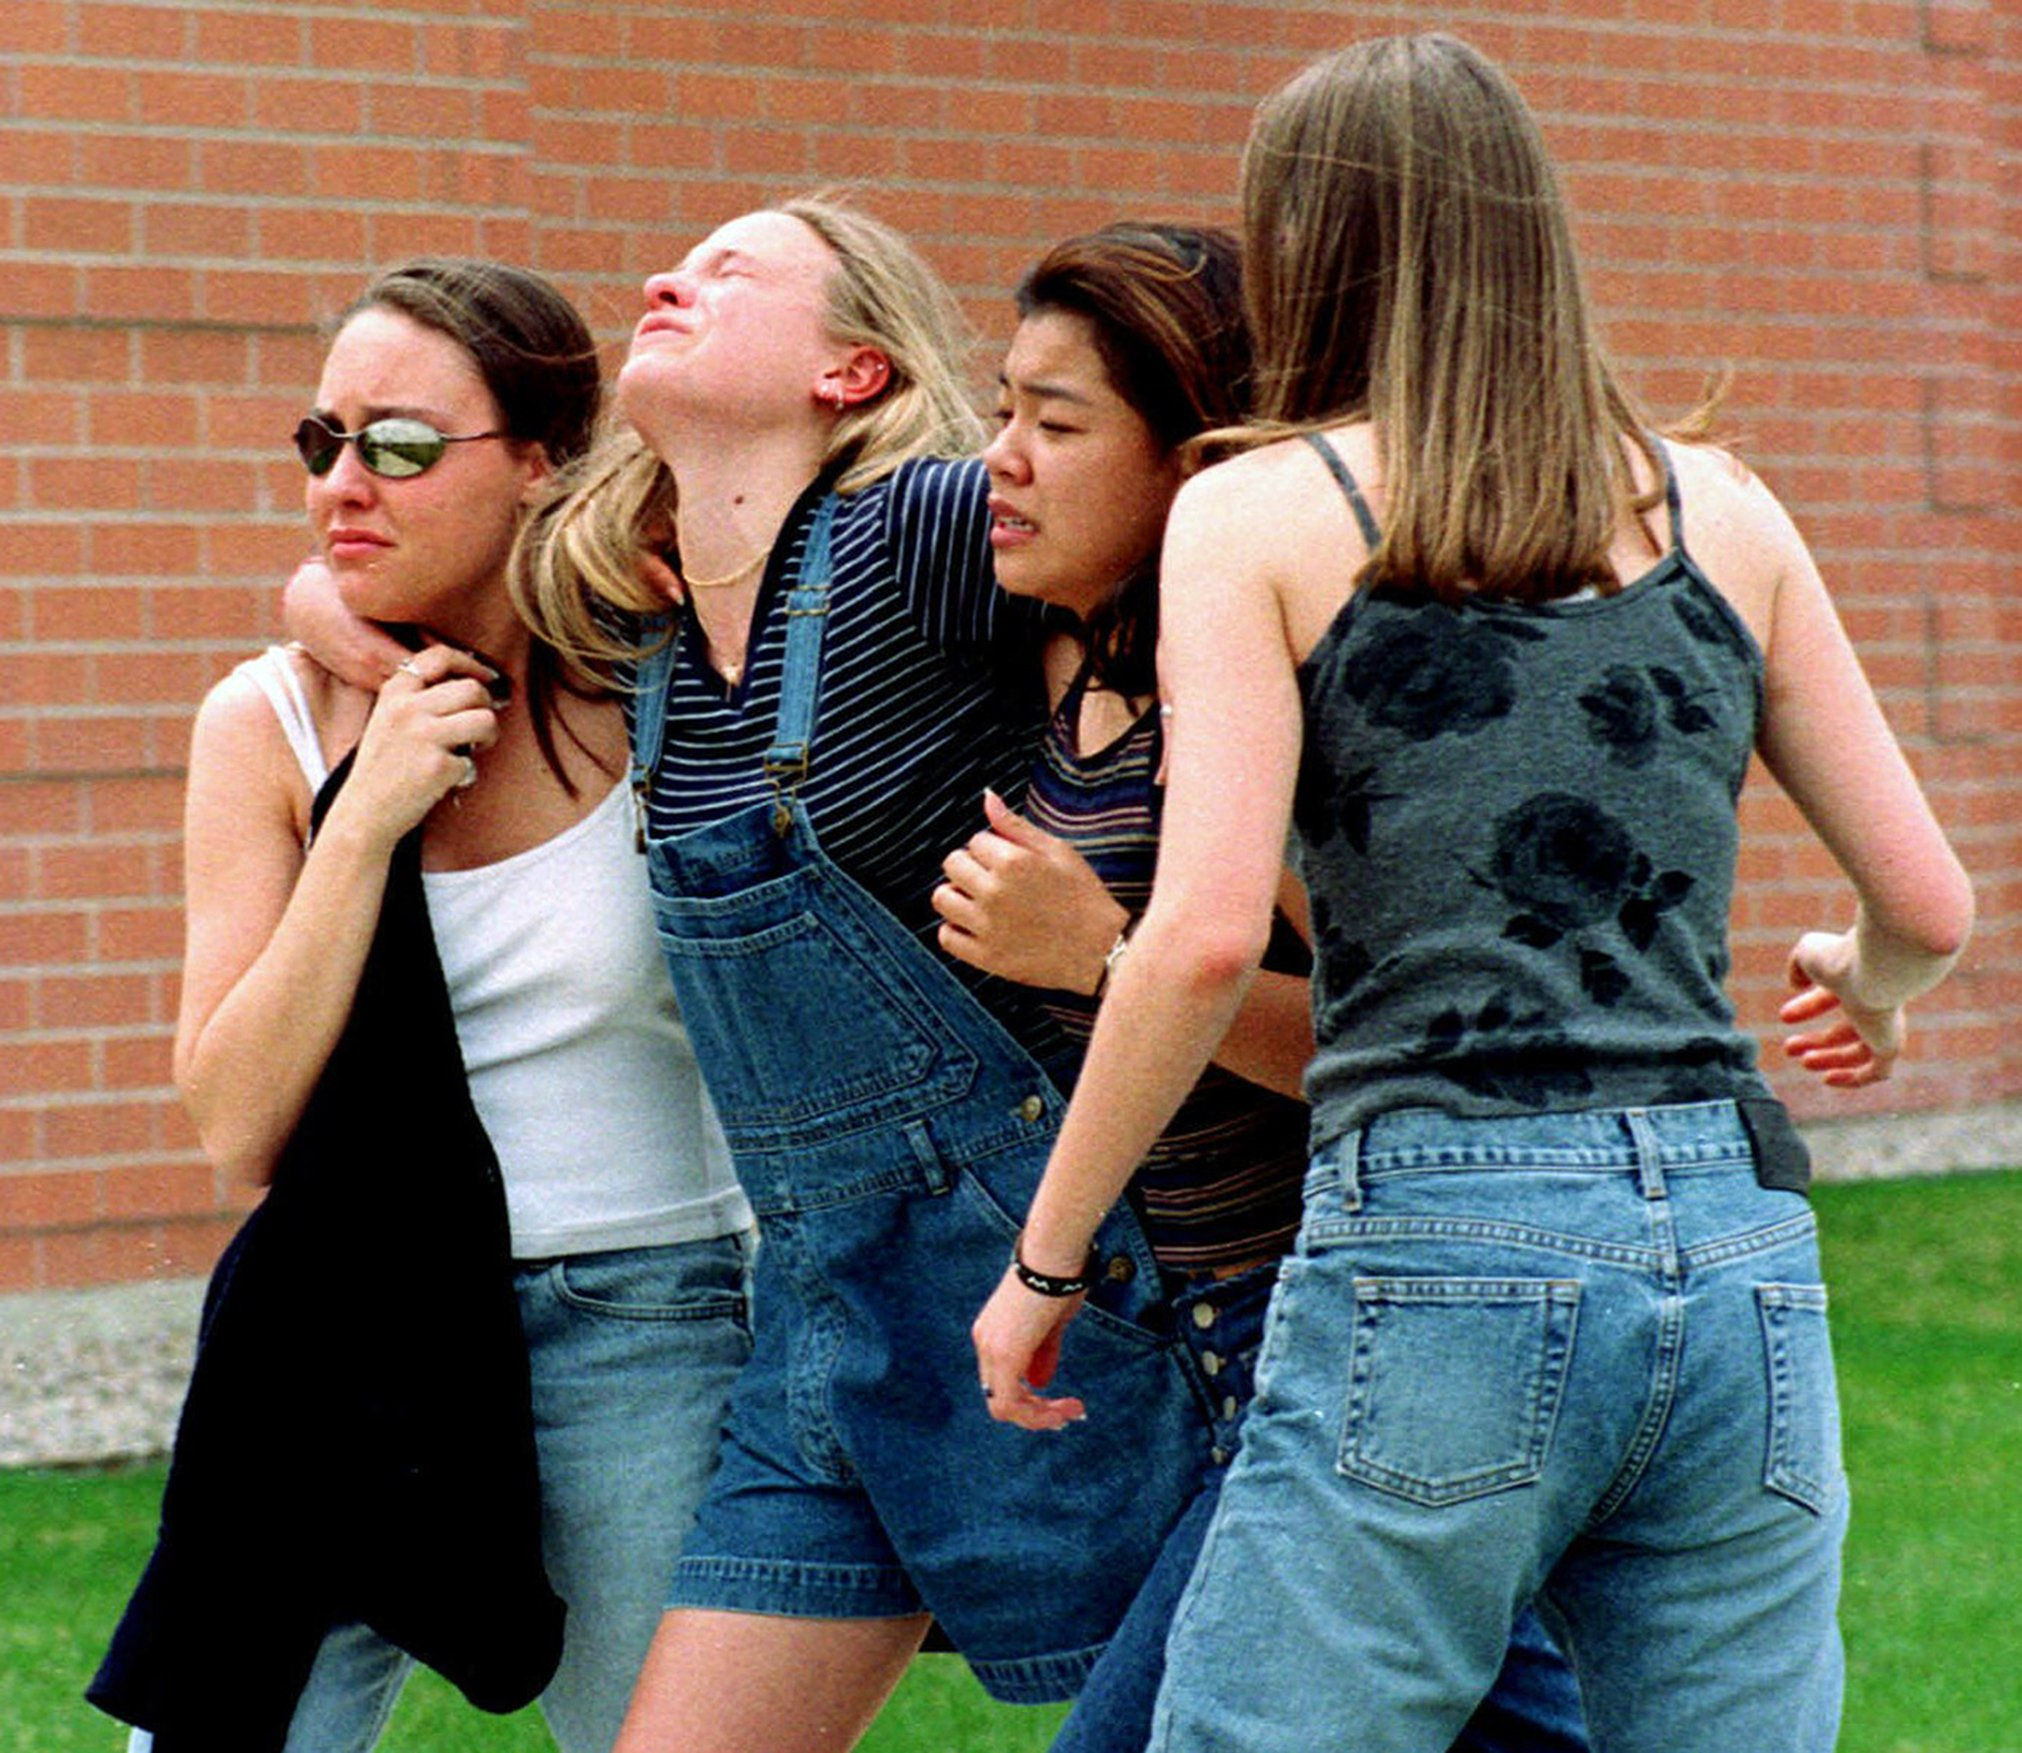 School Shooting In Suburban Denver: AP PHOTOS: Teen Gunmen Unleashed Horror At Columbine In 1999